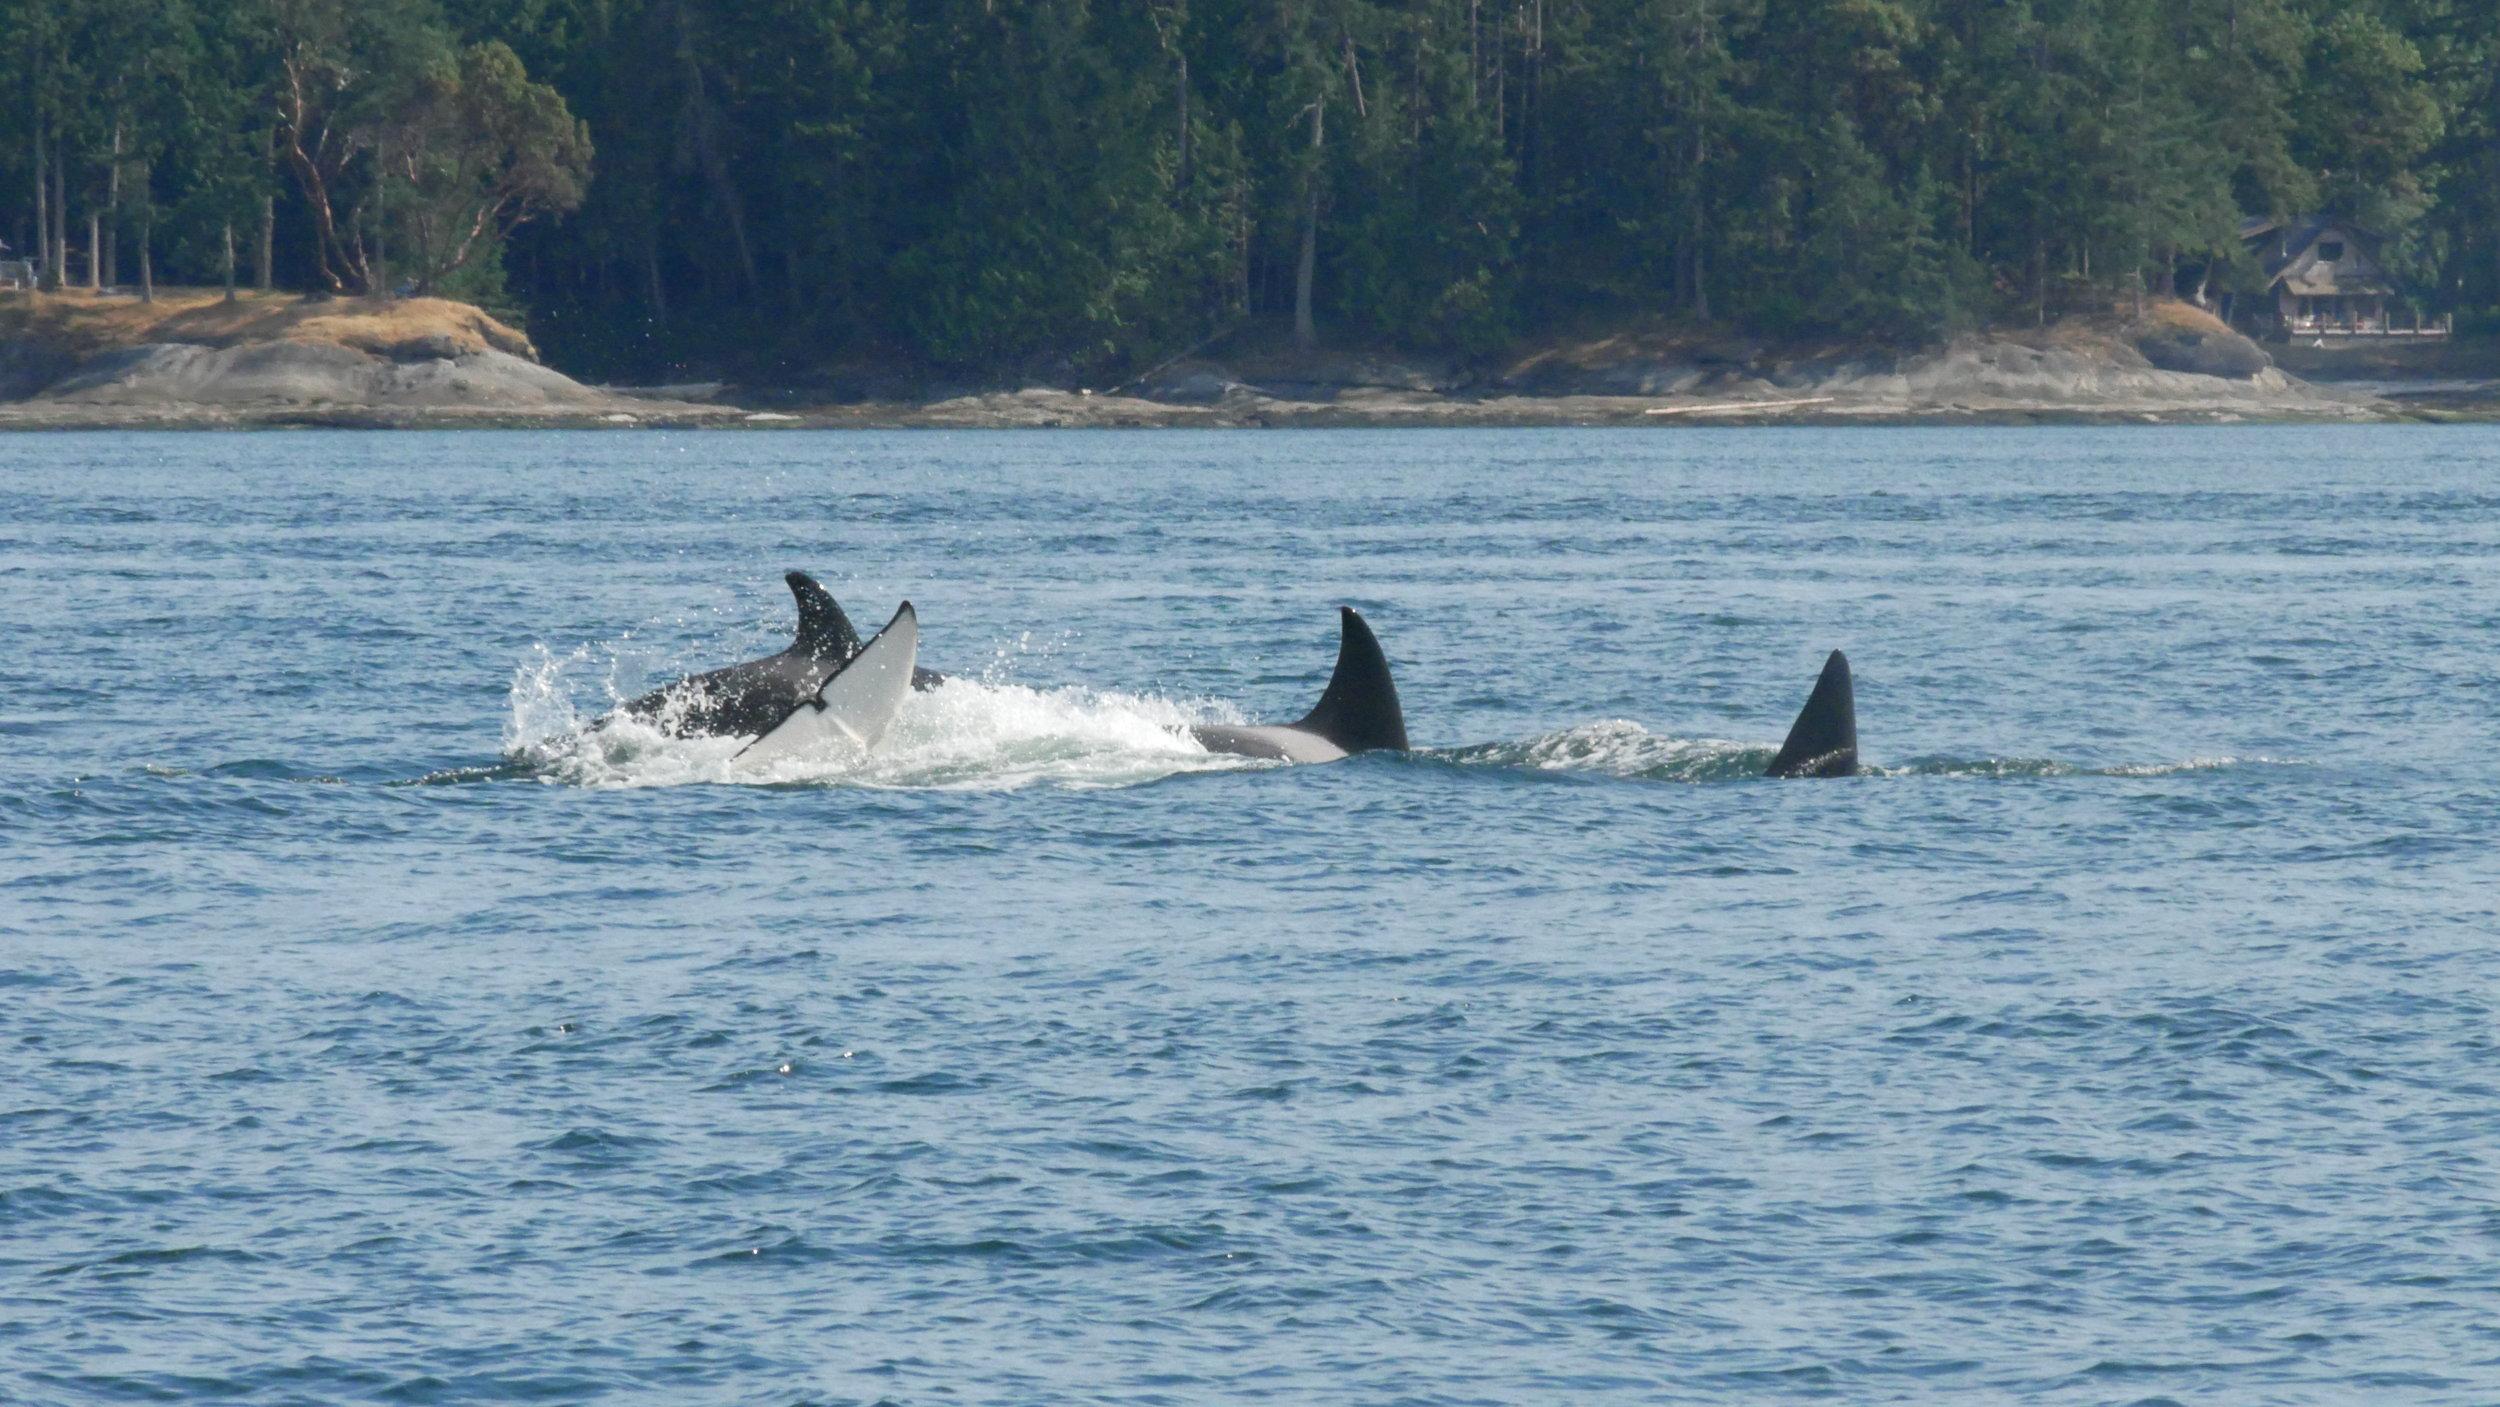 Spot the fluke! Photo by Cheyenne Brewster (3:30).